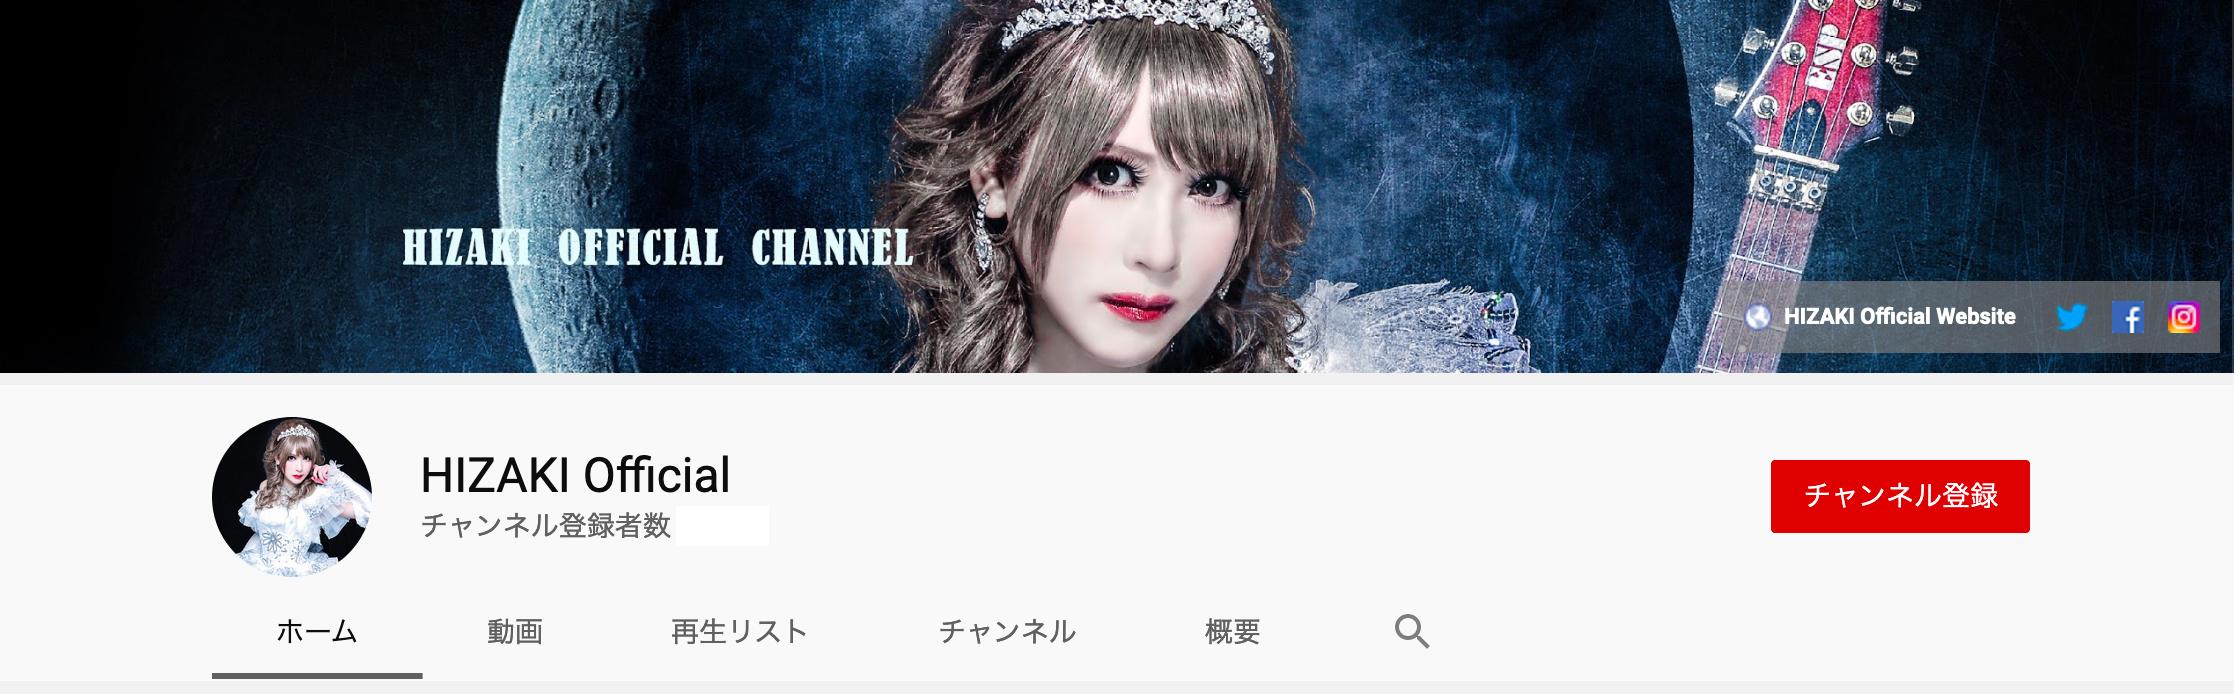 HIZAKI YouTube Channel start!